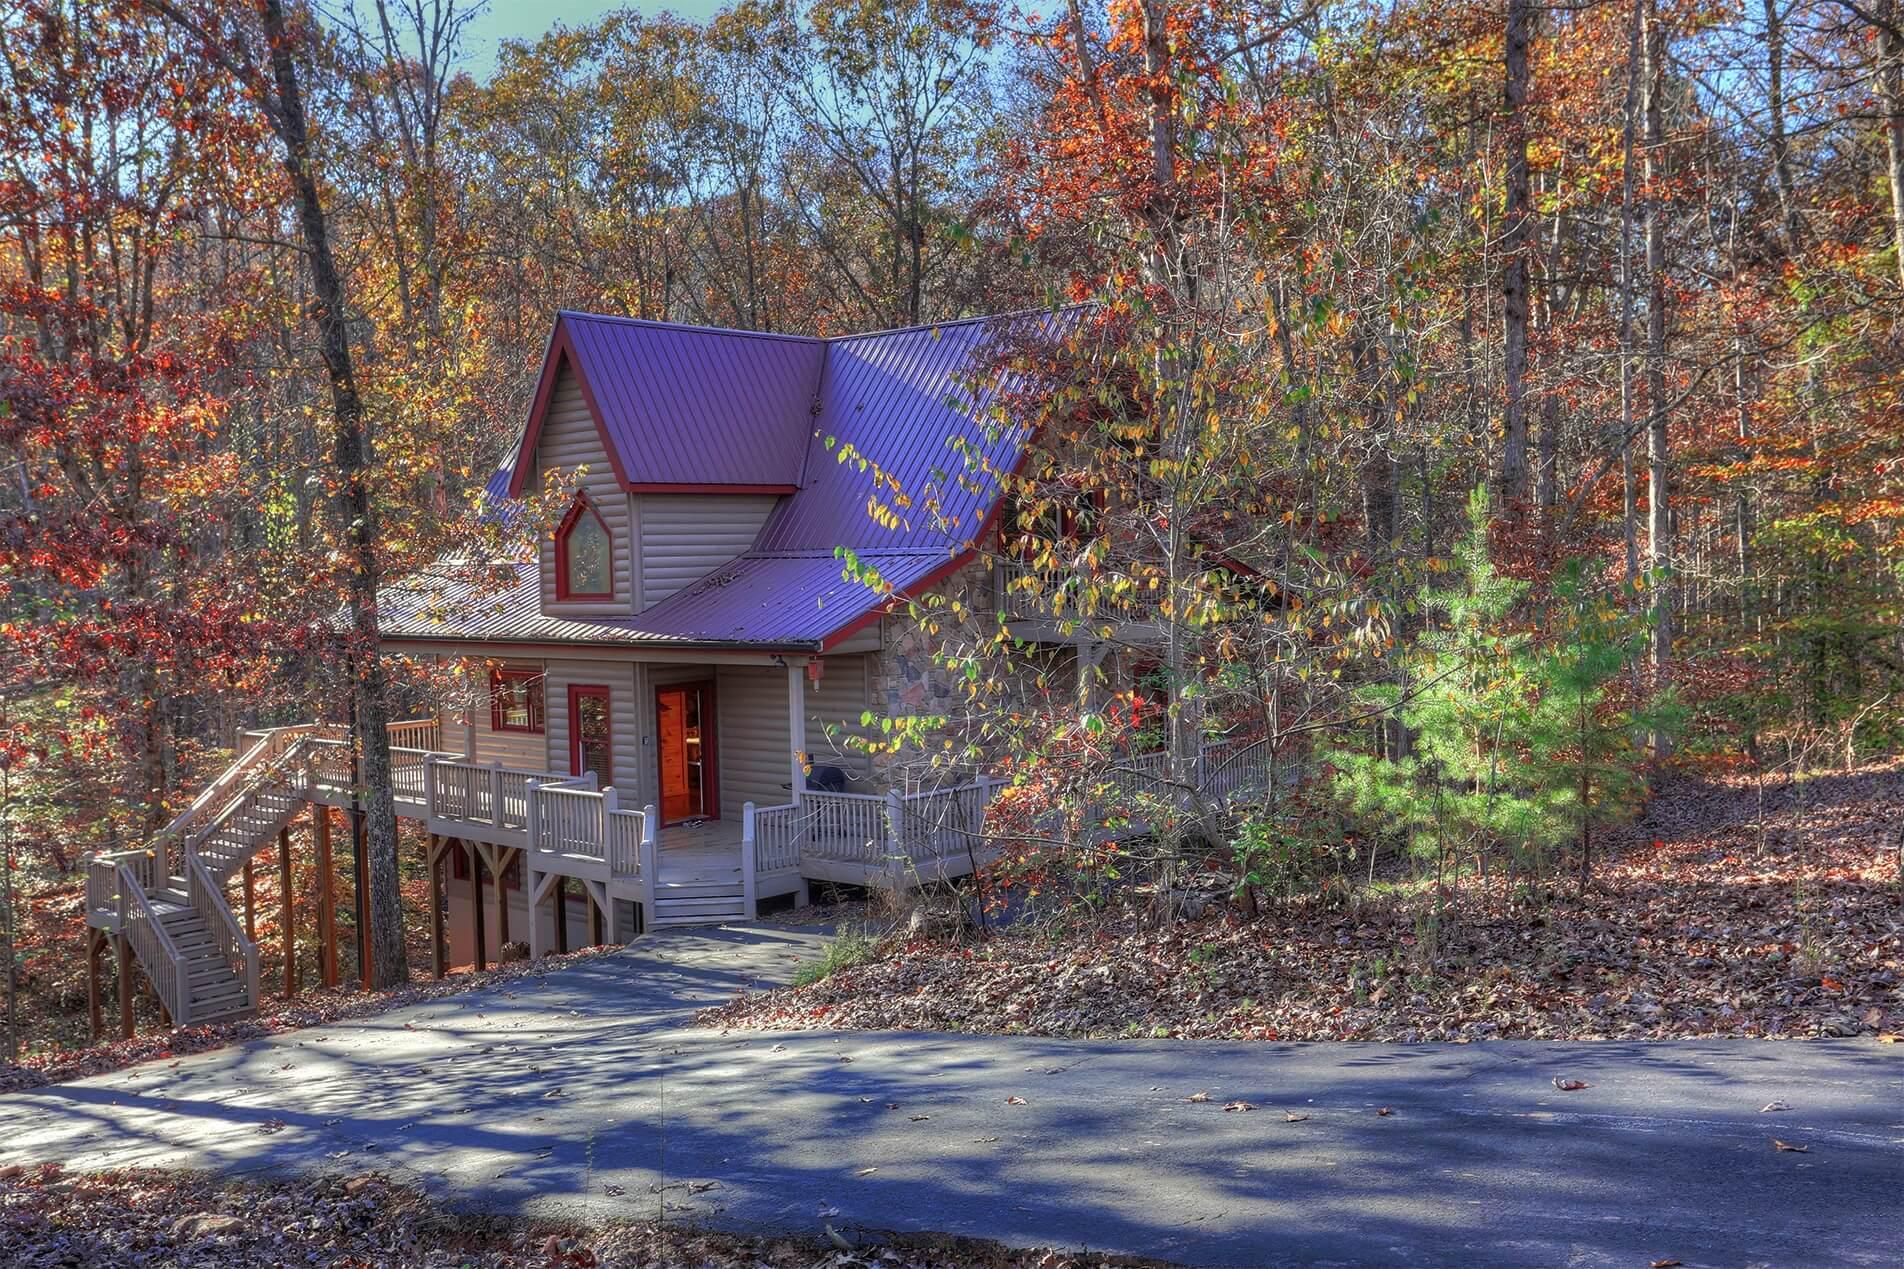 Hickory-Woods-Cedar-Creek-Cabin-Rentals-Helen-Georgia-top-banner-tiny